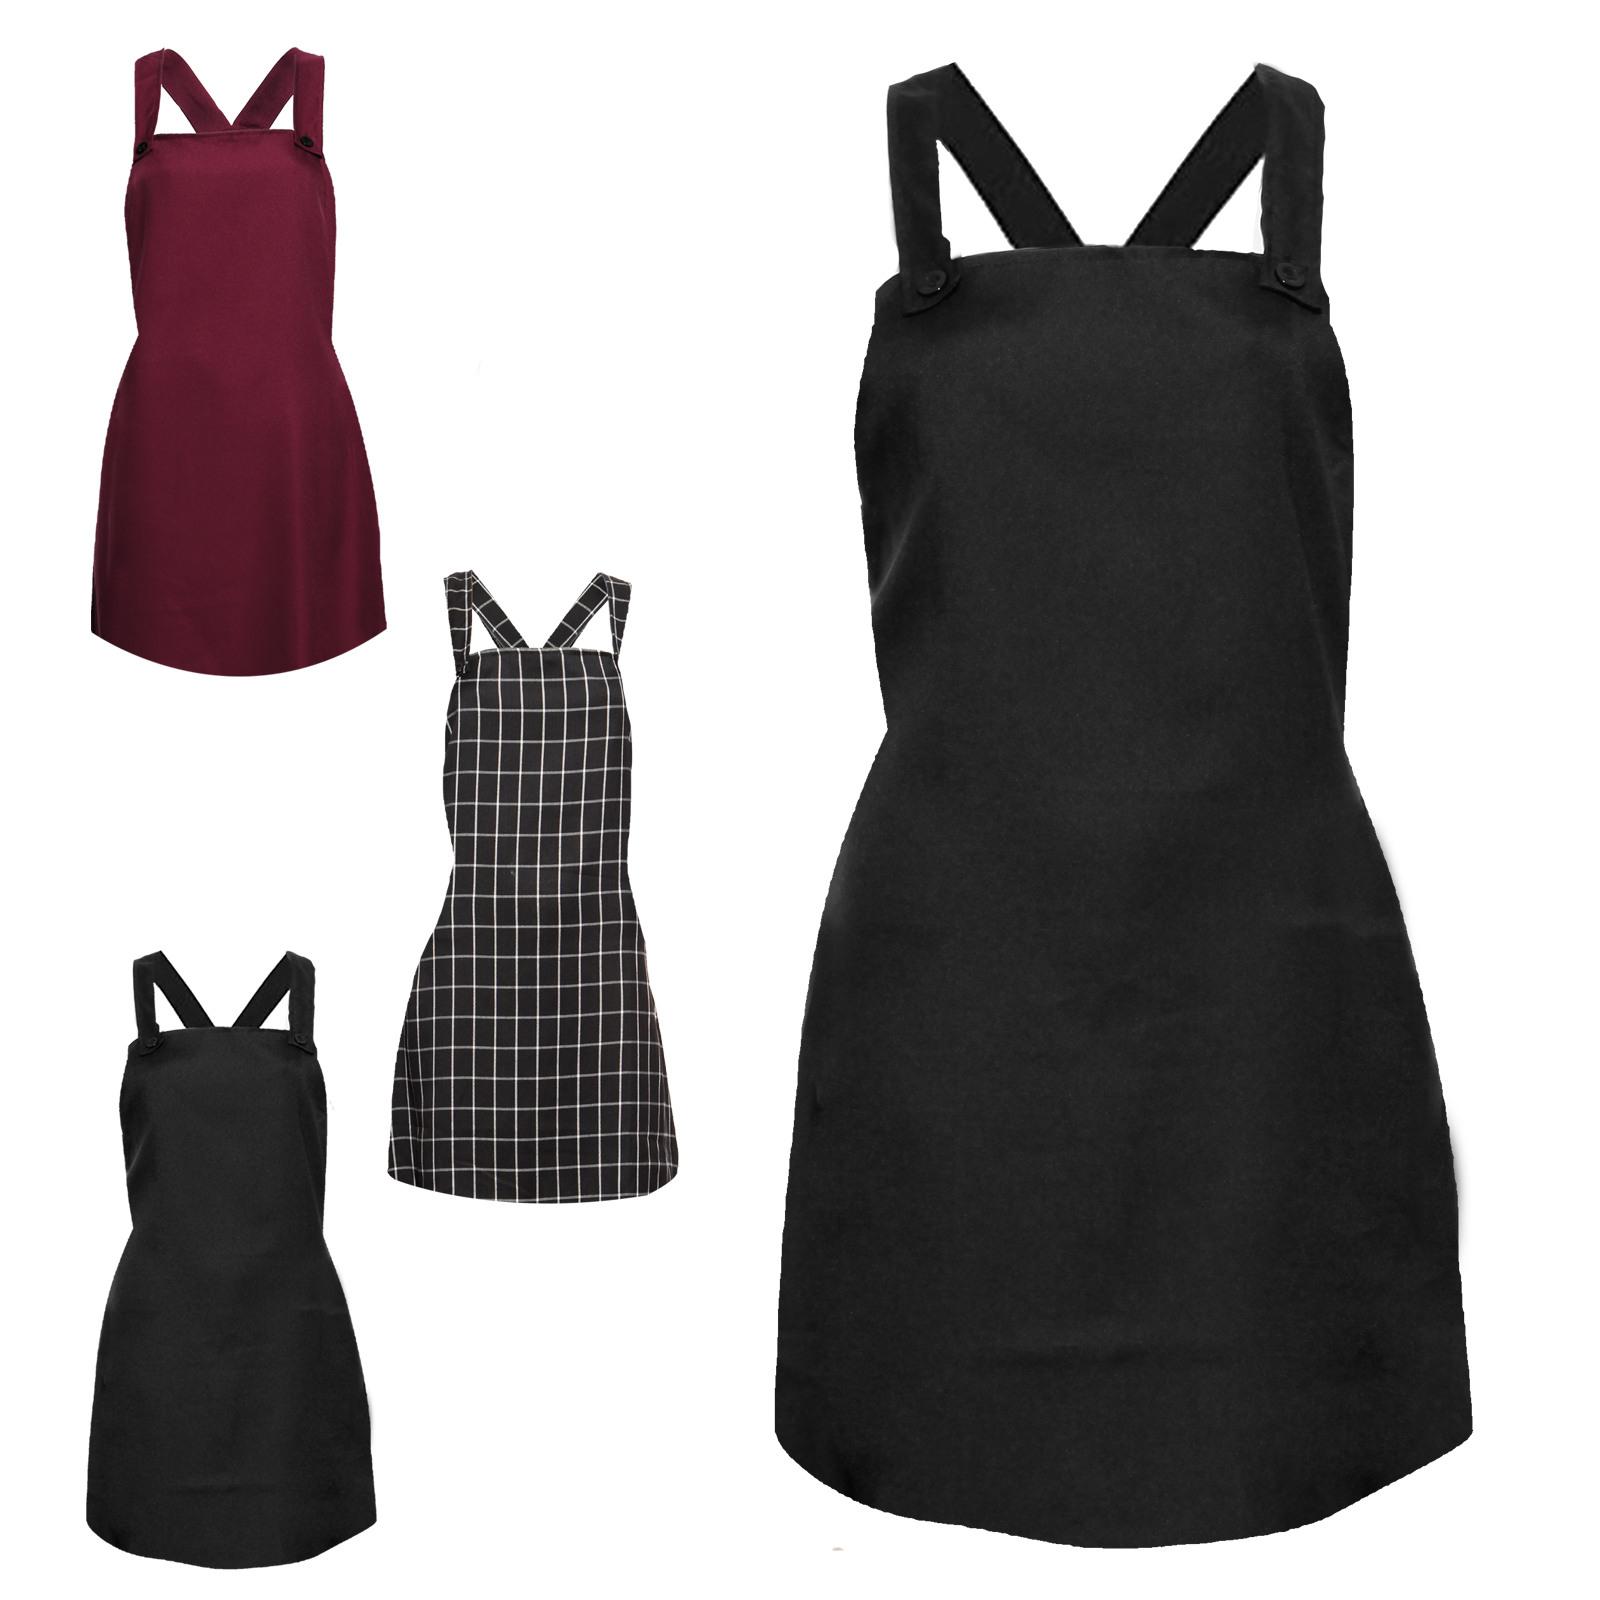 Damen Mini Rock Latz Kleid Latz Rock Träger Kleid Tunika